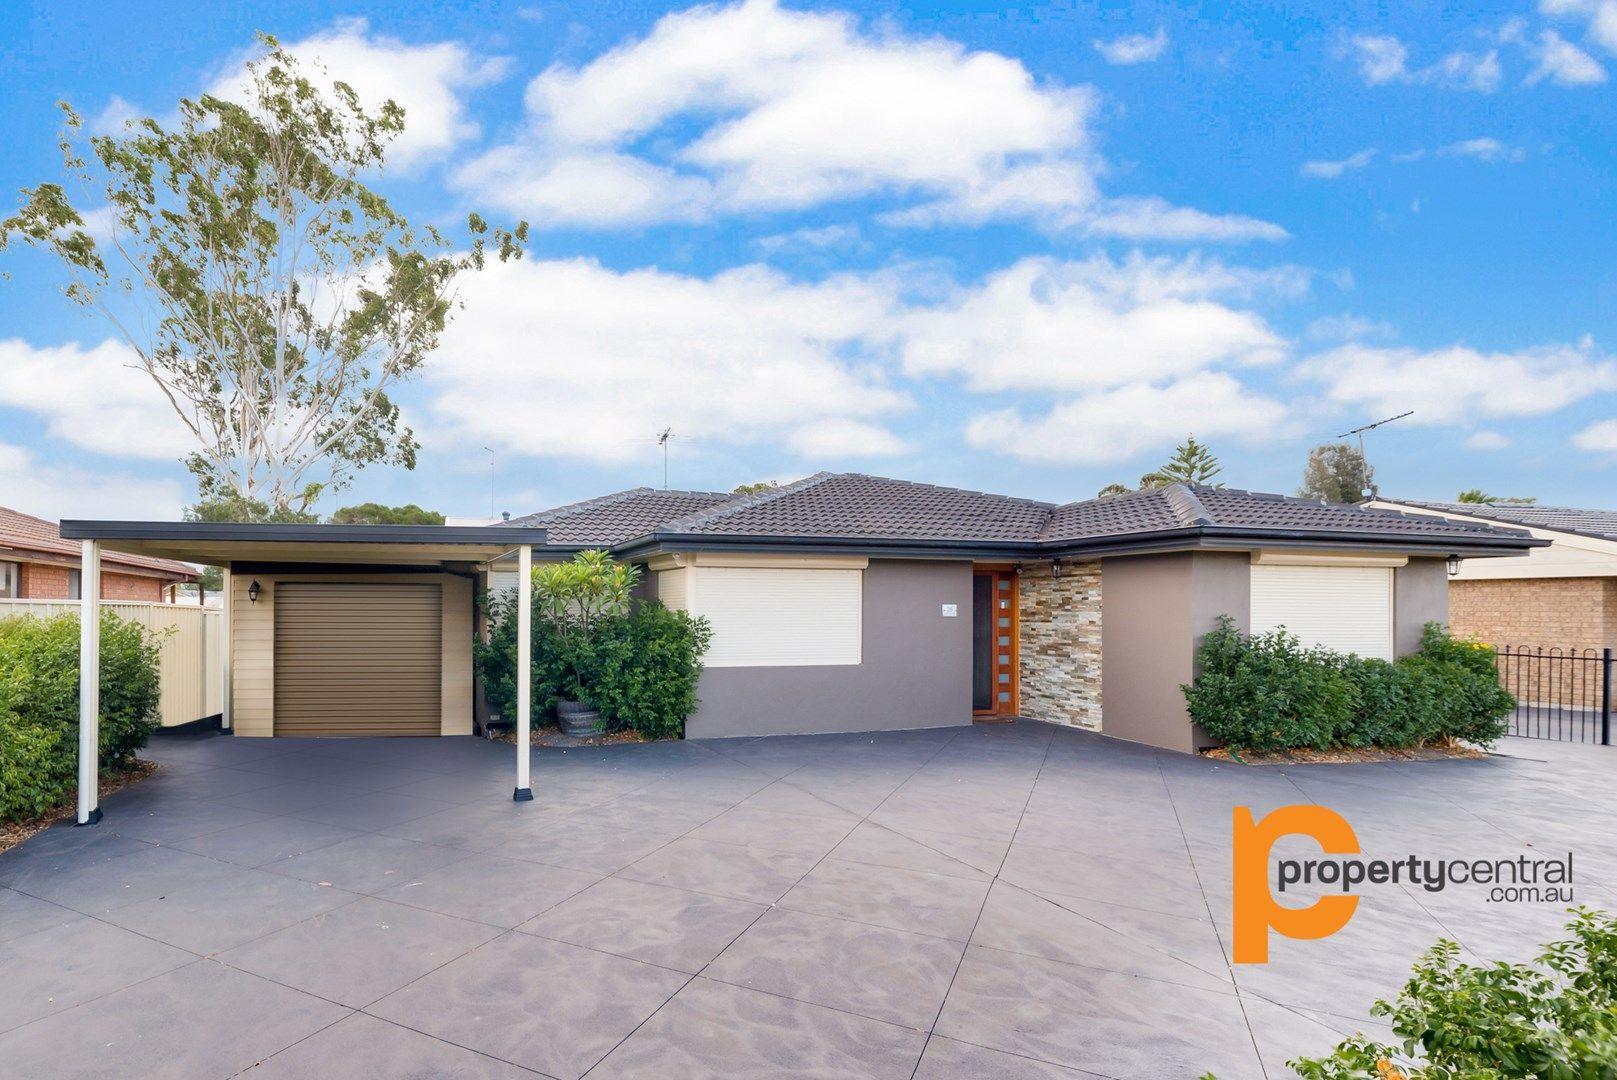 28 Greenbank Drive, Werrington Downs NSW 2747, Image 0